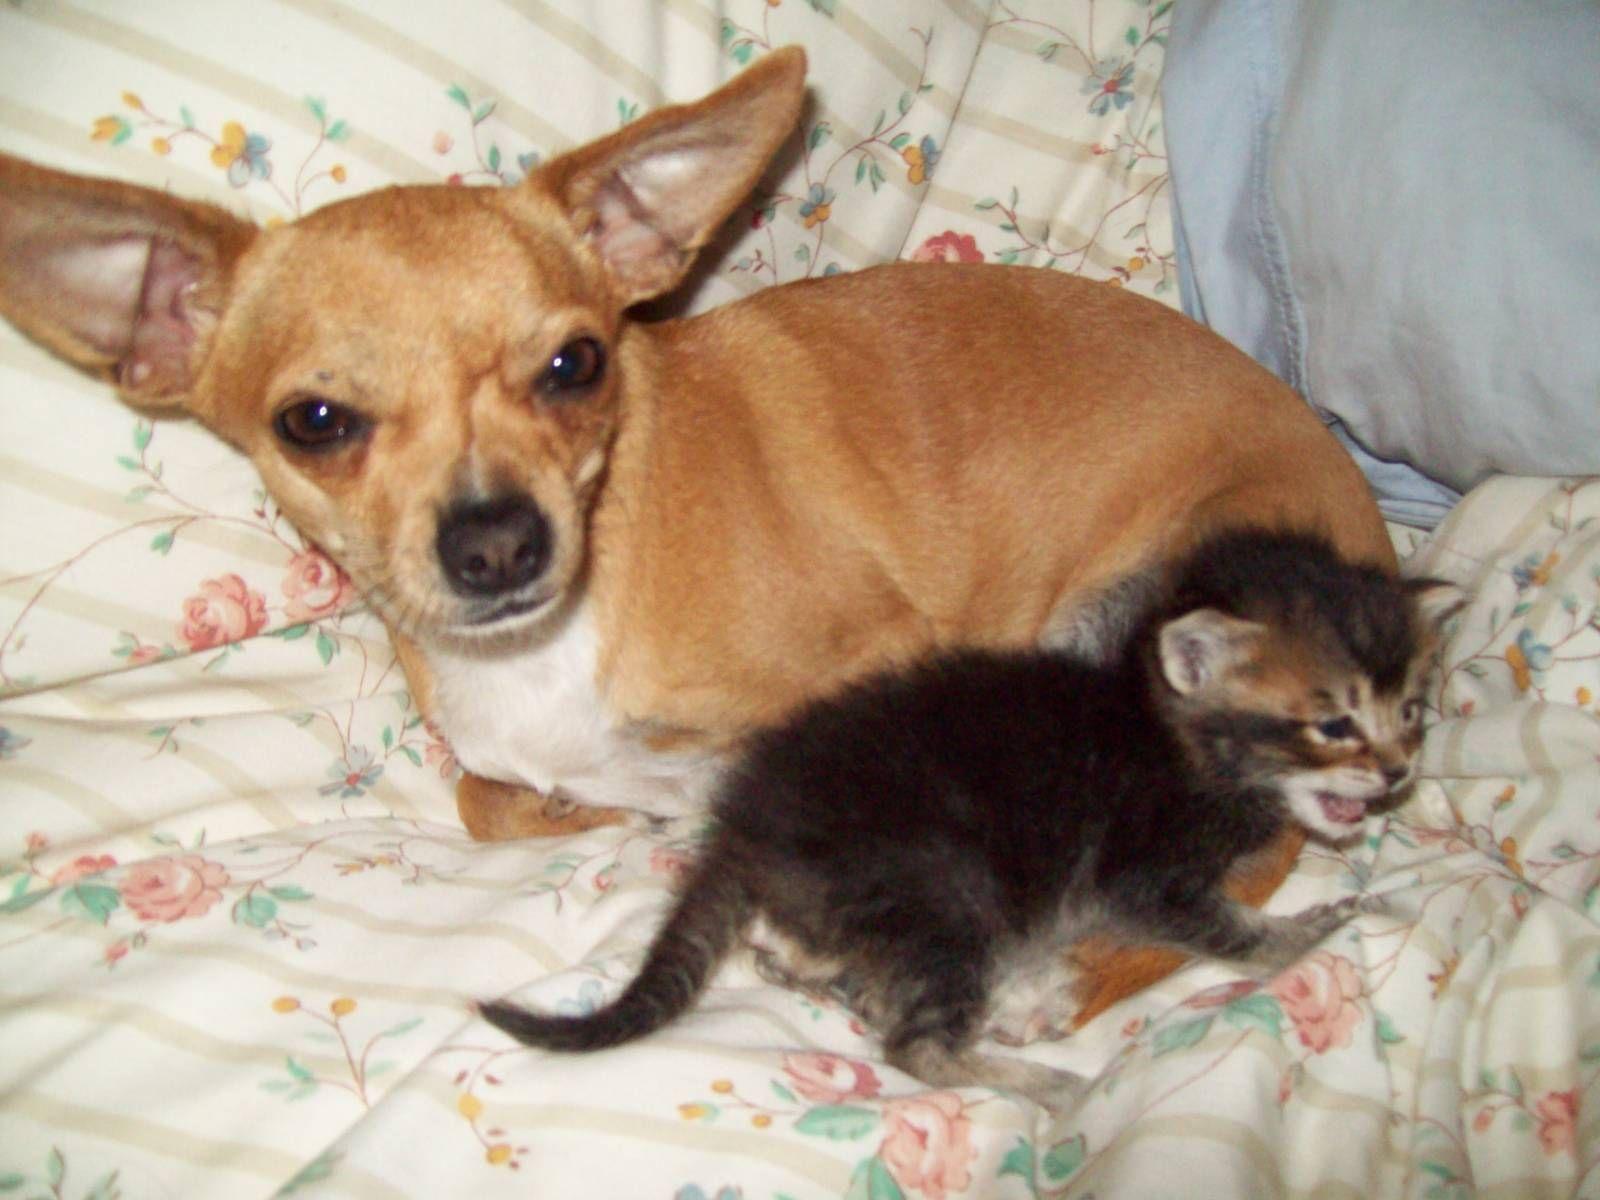 Chihuahua And Kitten Chihuahuas 13516911 1600 1200 Jpg 1600 1200